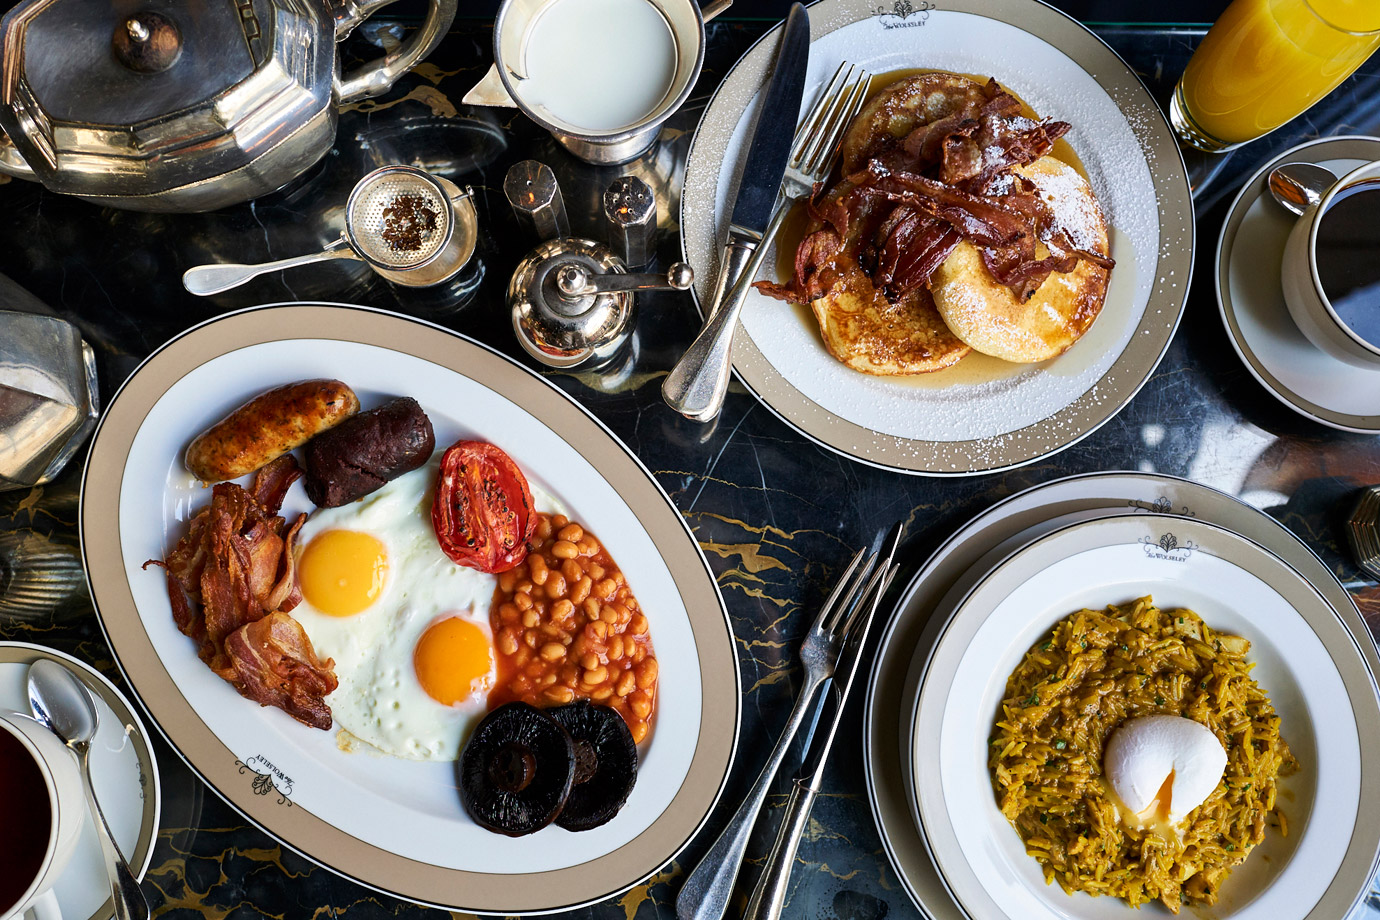 The-English,-Pancakes-with-Bacon,-Egg-White-Frittata_The-Wolseley_David-Loftus_2018